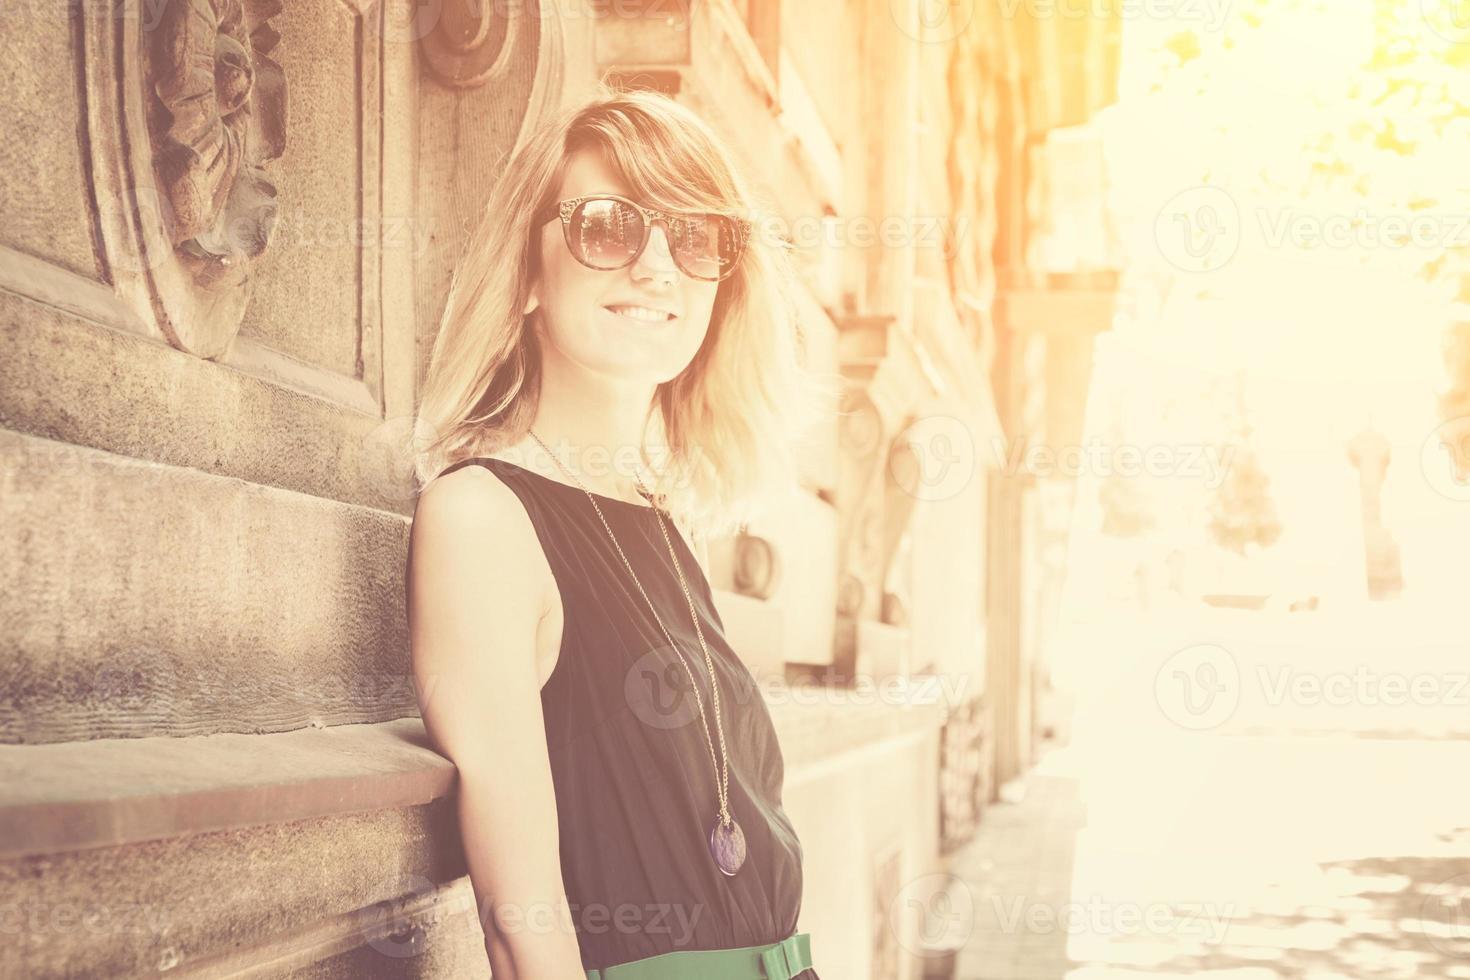 garota urbana foto